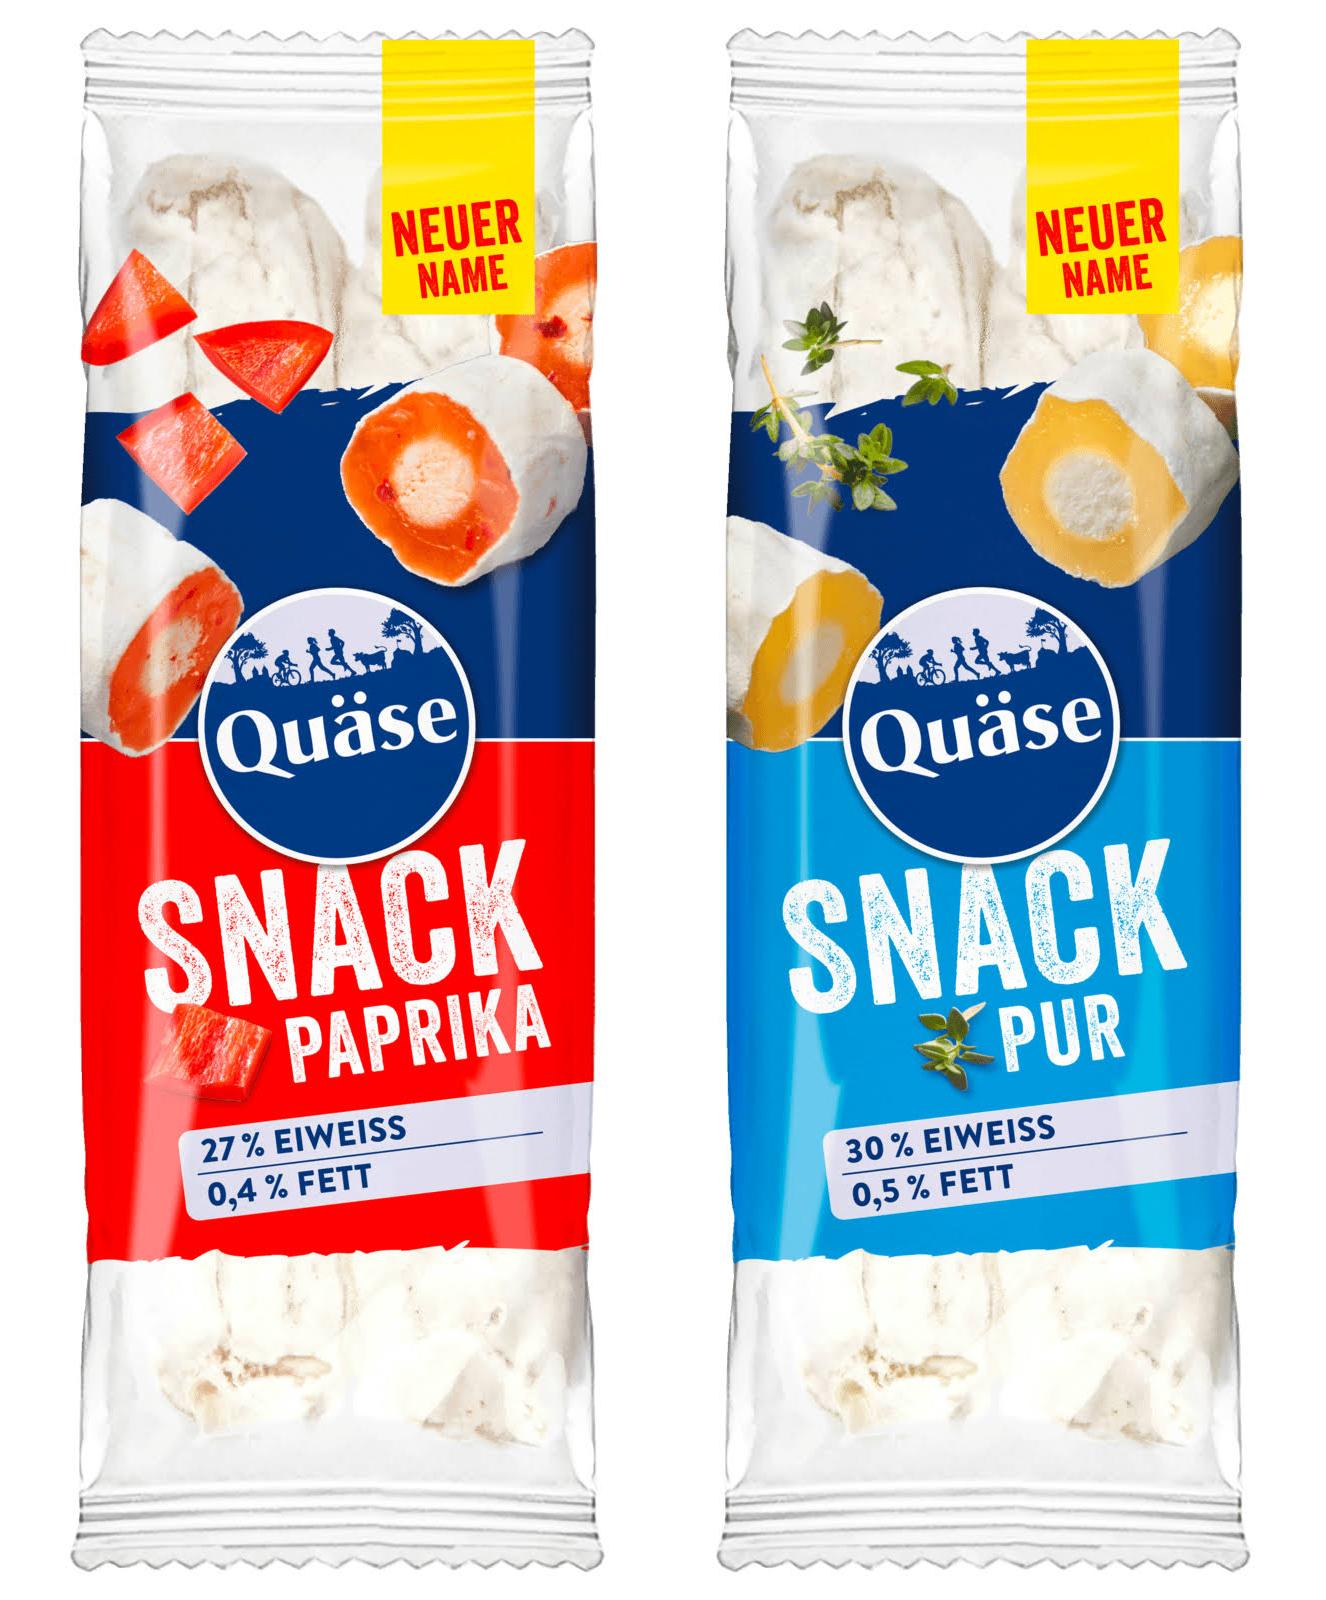 Quaese-Snack.jpg